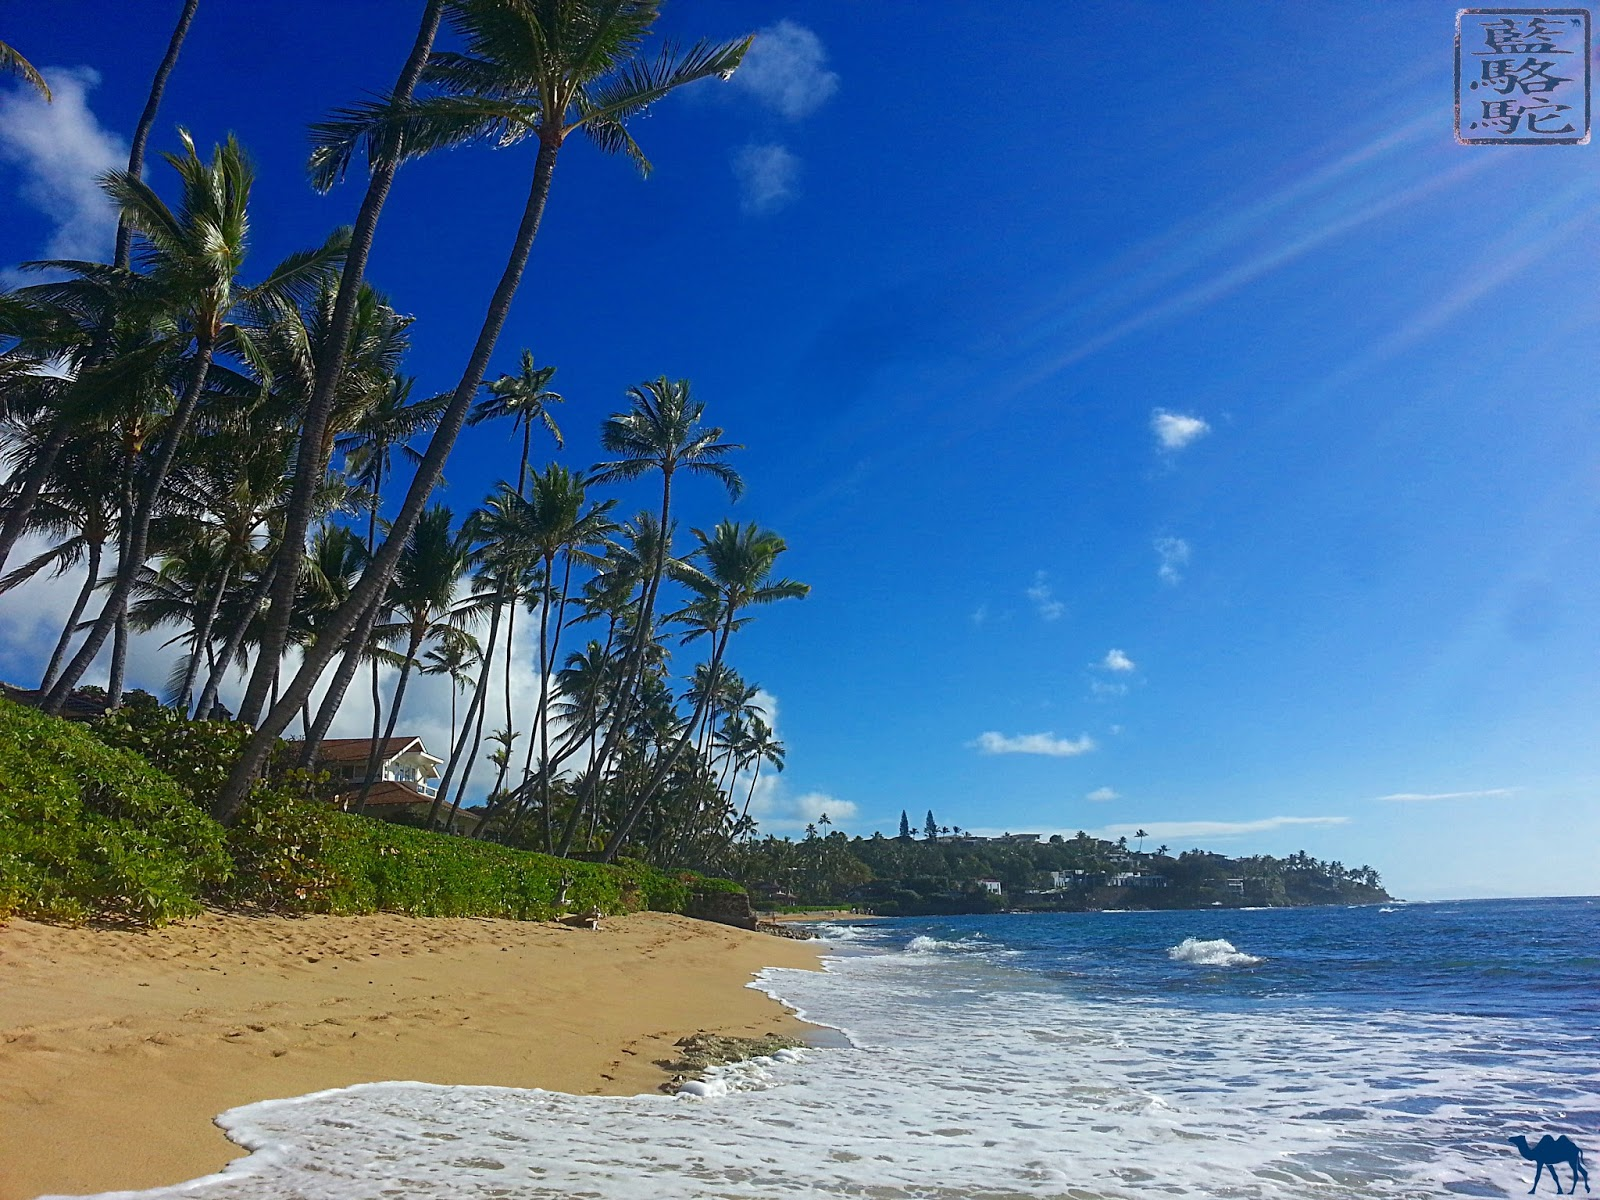 Le Chameau Bleu - Instantanés d'Hawaii - Voyage à Hawaii